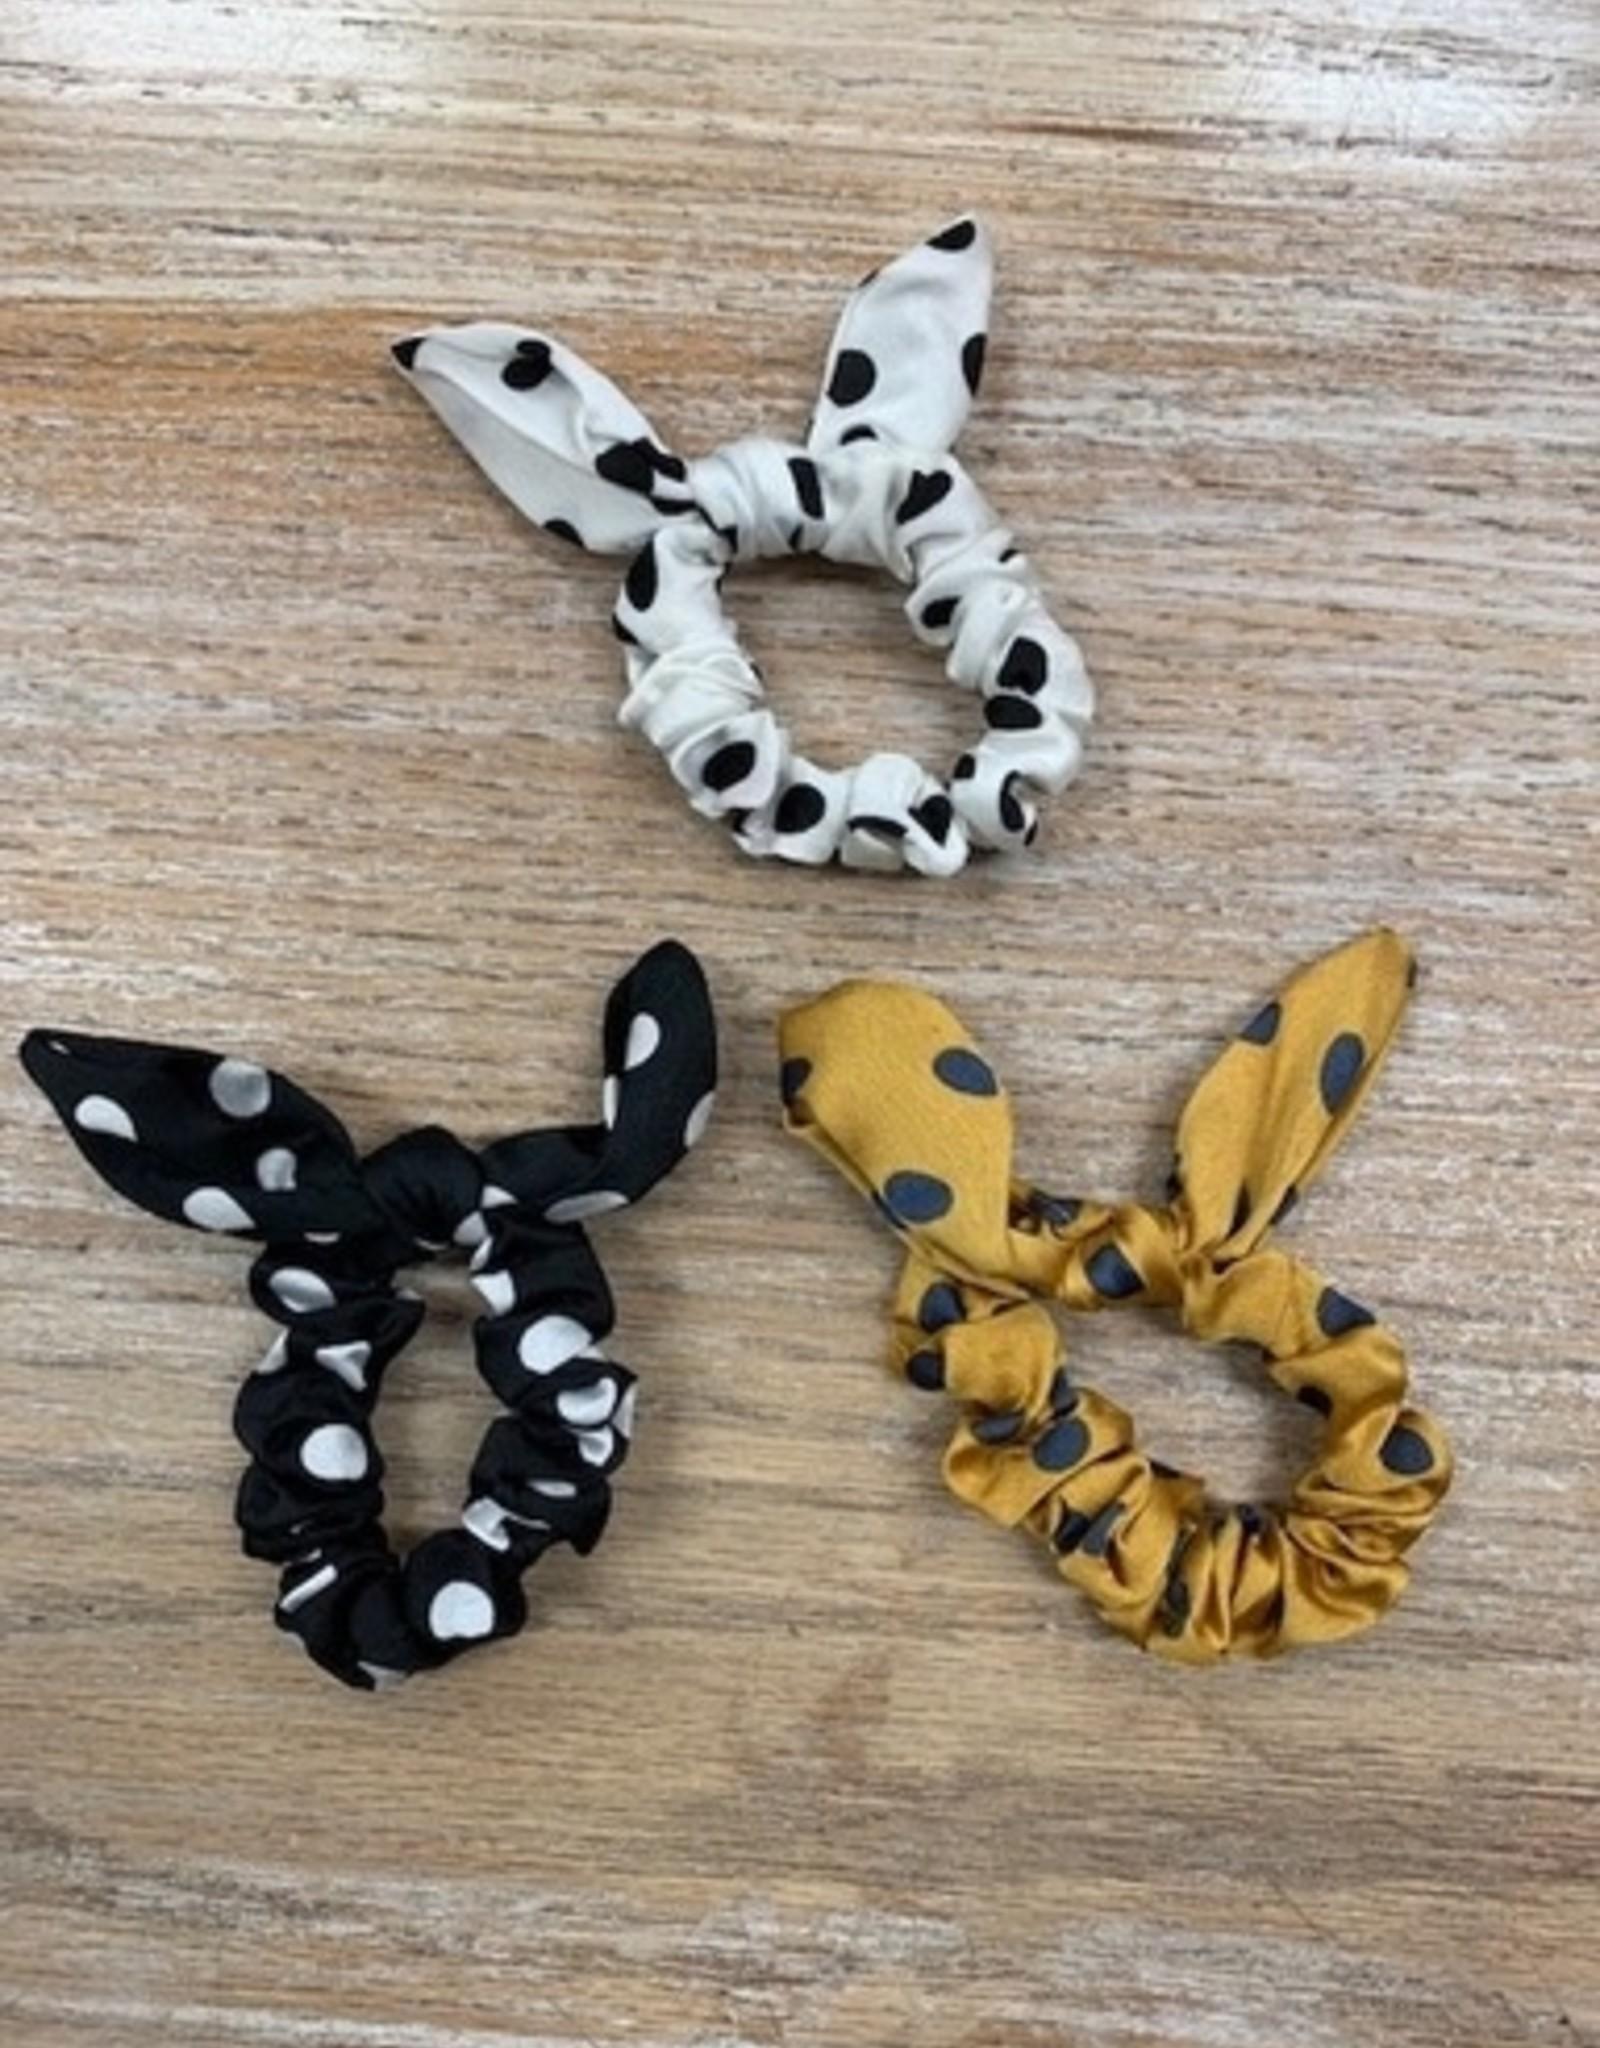 Accessory Polka Dot Rabbit Ear Hair Tie